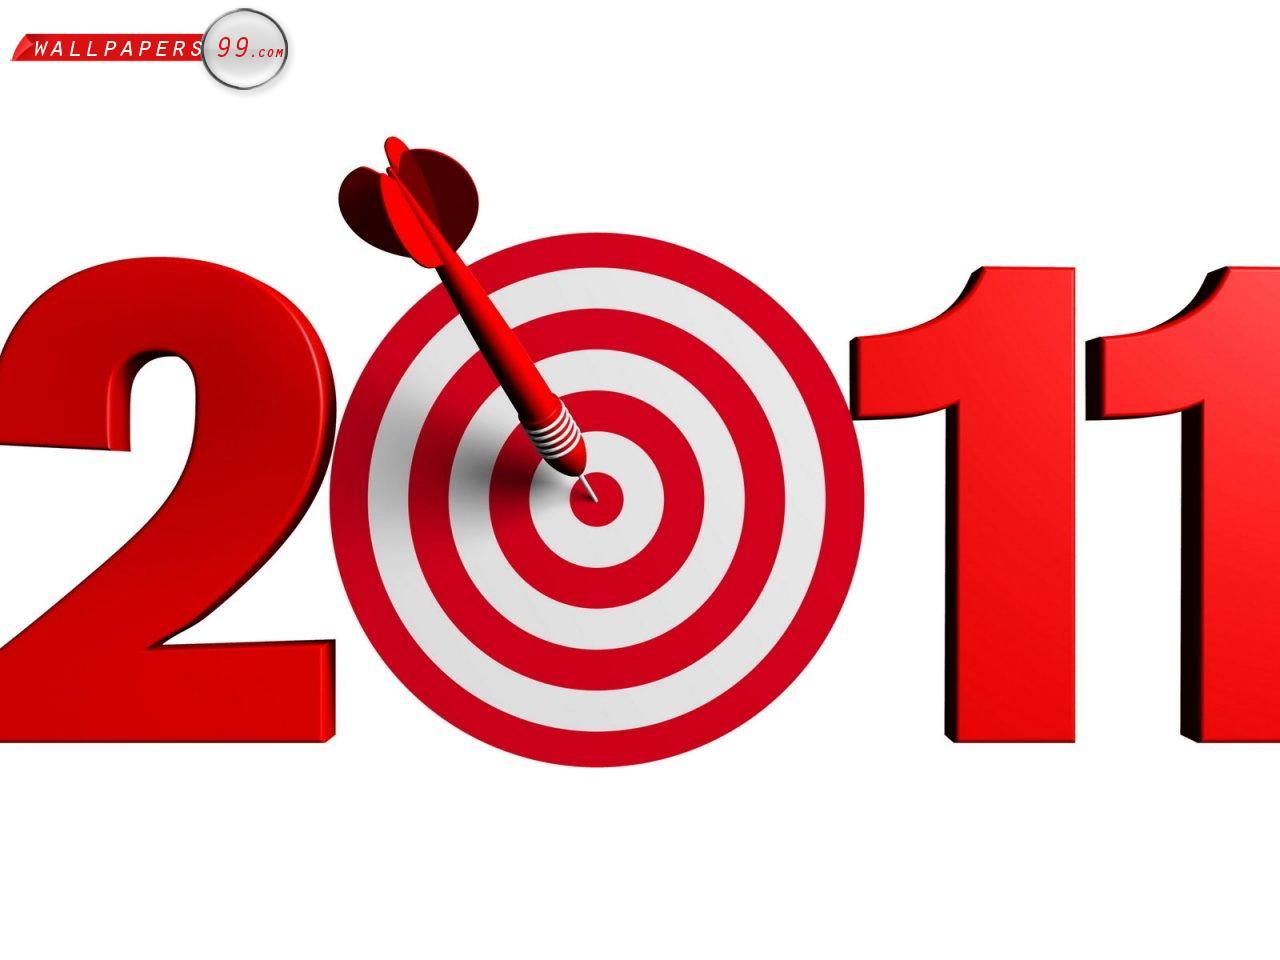 http://4.bp.blogspot.com/-R5Awa0EIW0U/TwDbEc58PaI/AAAAAAAACb4/5zqi7DISBOE/s1600/4331-darts-target-2011-wallpaper.jpg